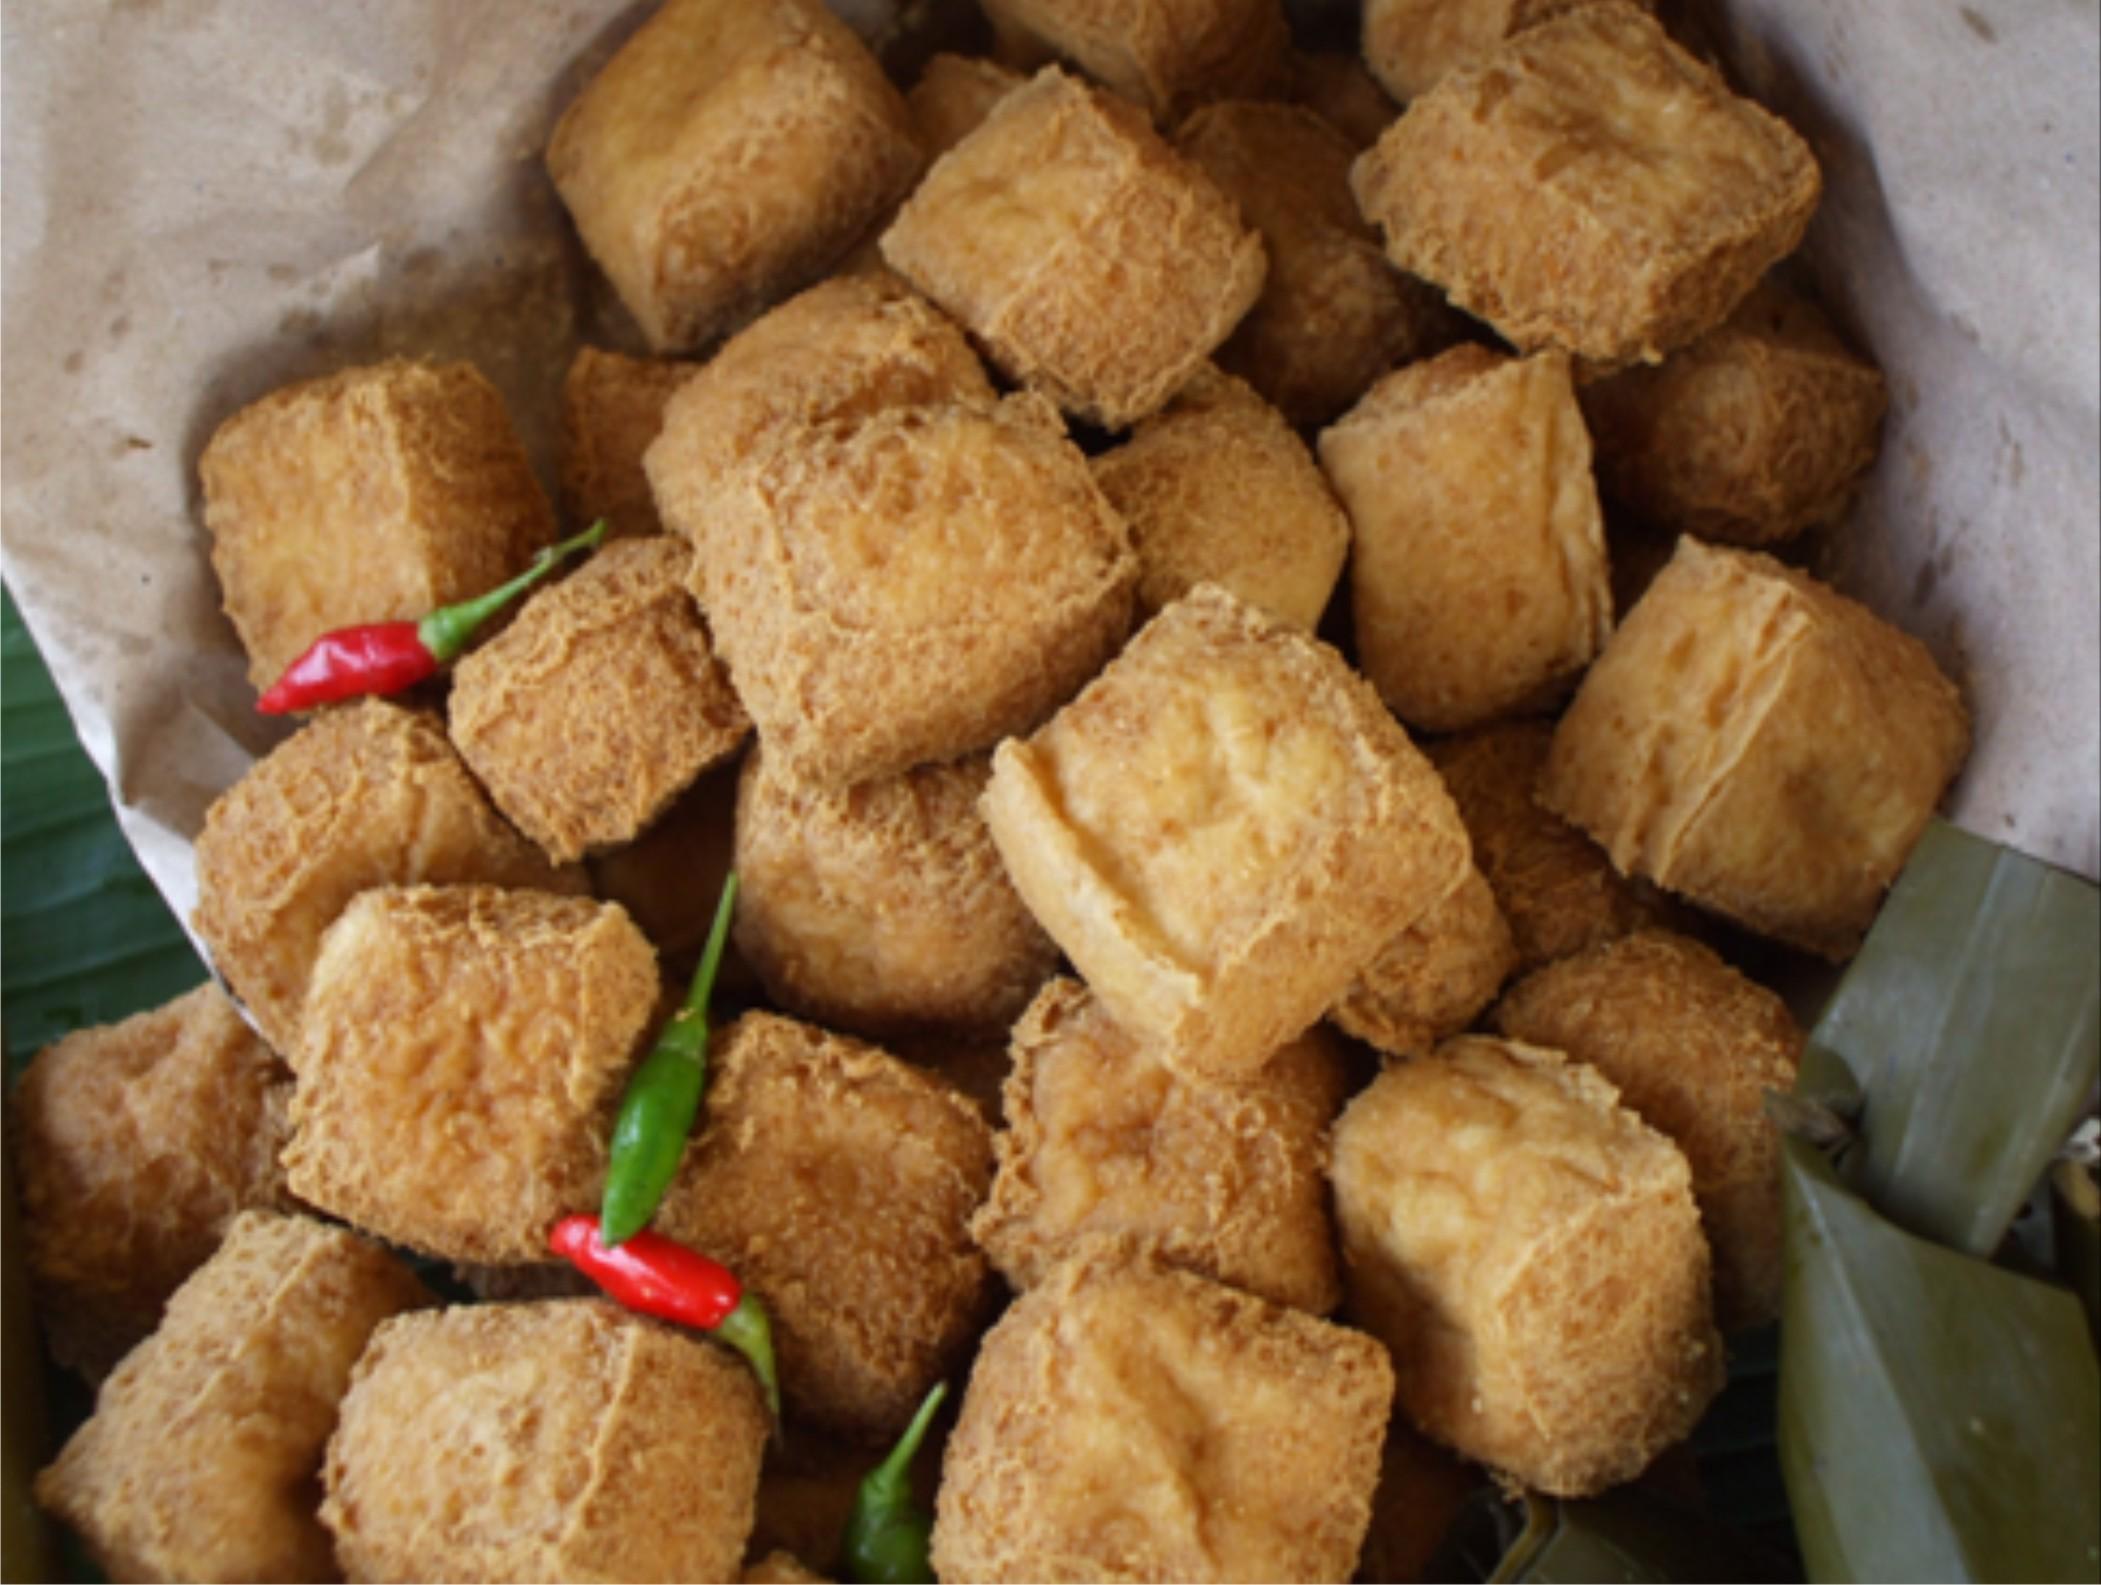 Tahu Sumedang Indonesian Food Picture 2386   Ongur 2101x1585